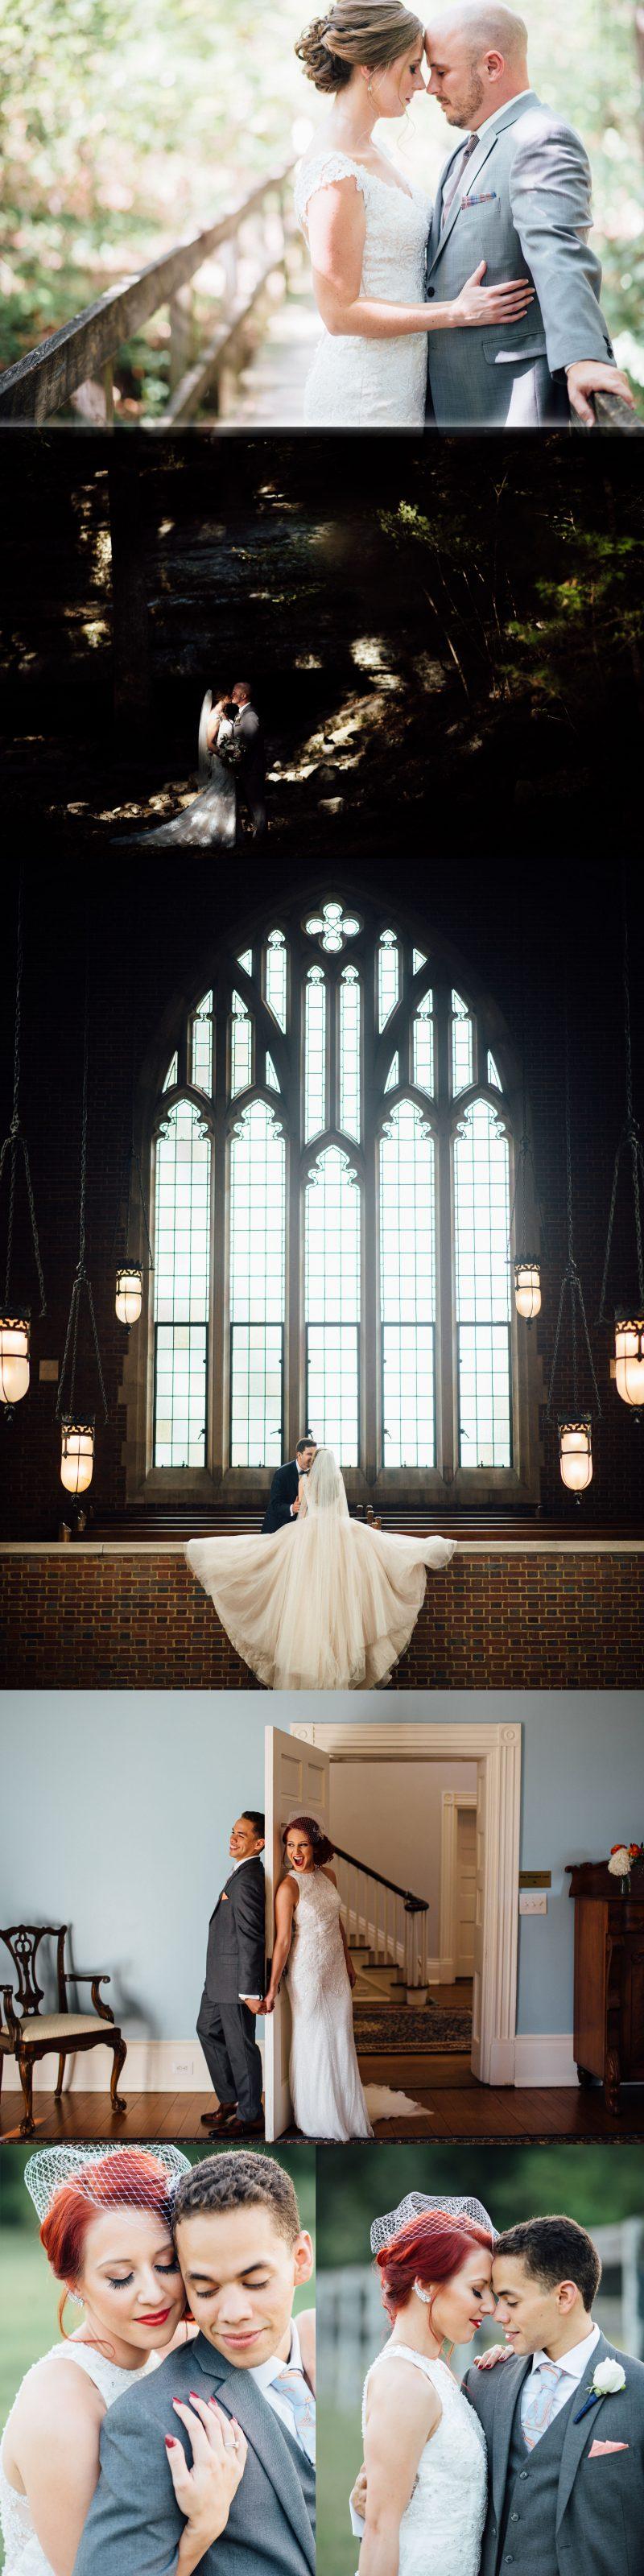 instagram5-800x3200 Best of Weddings 2016